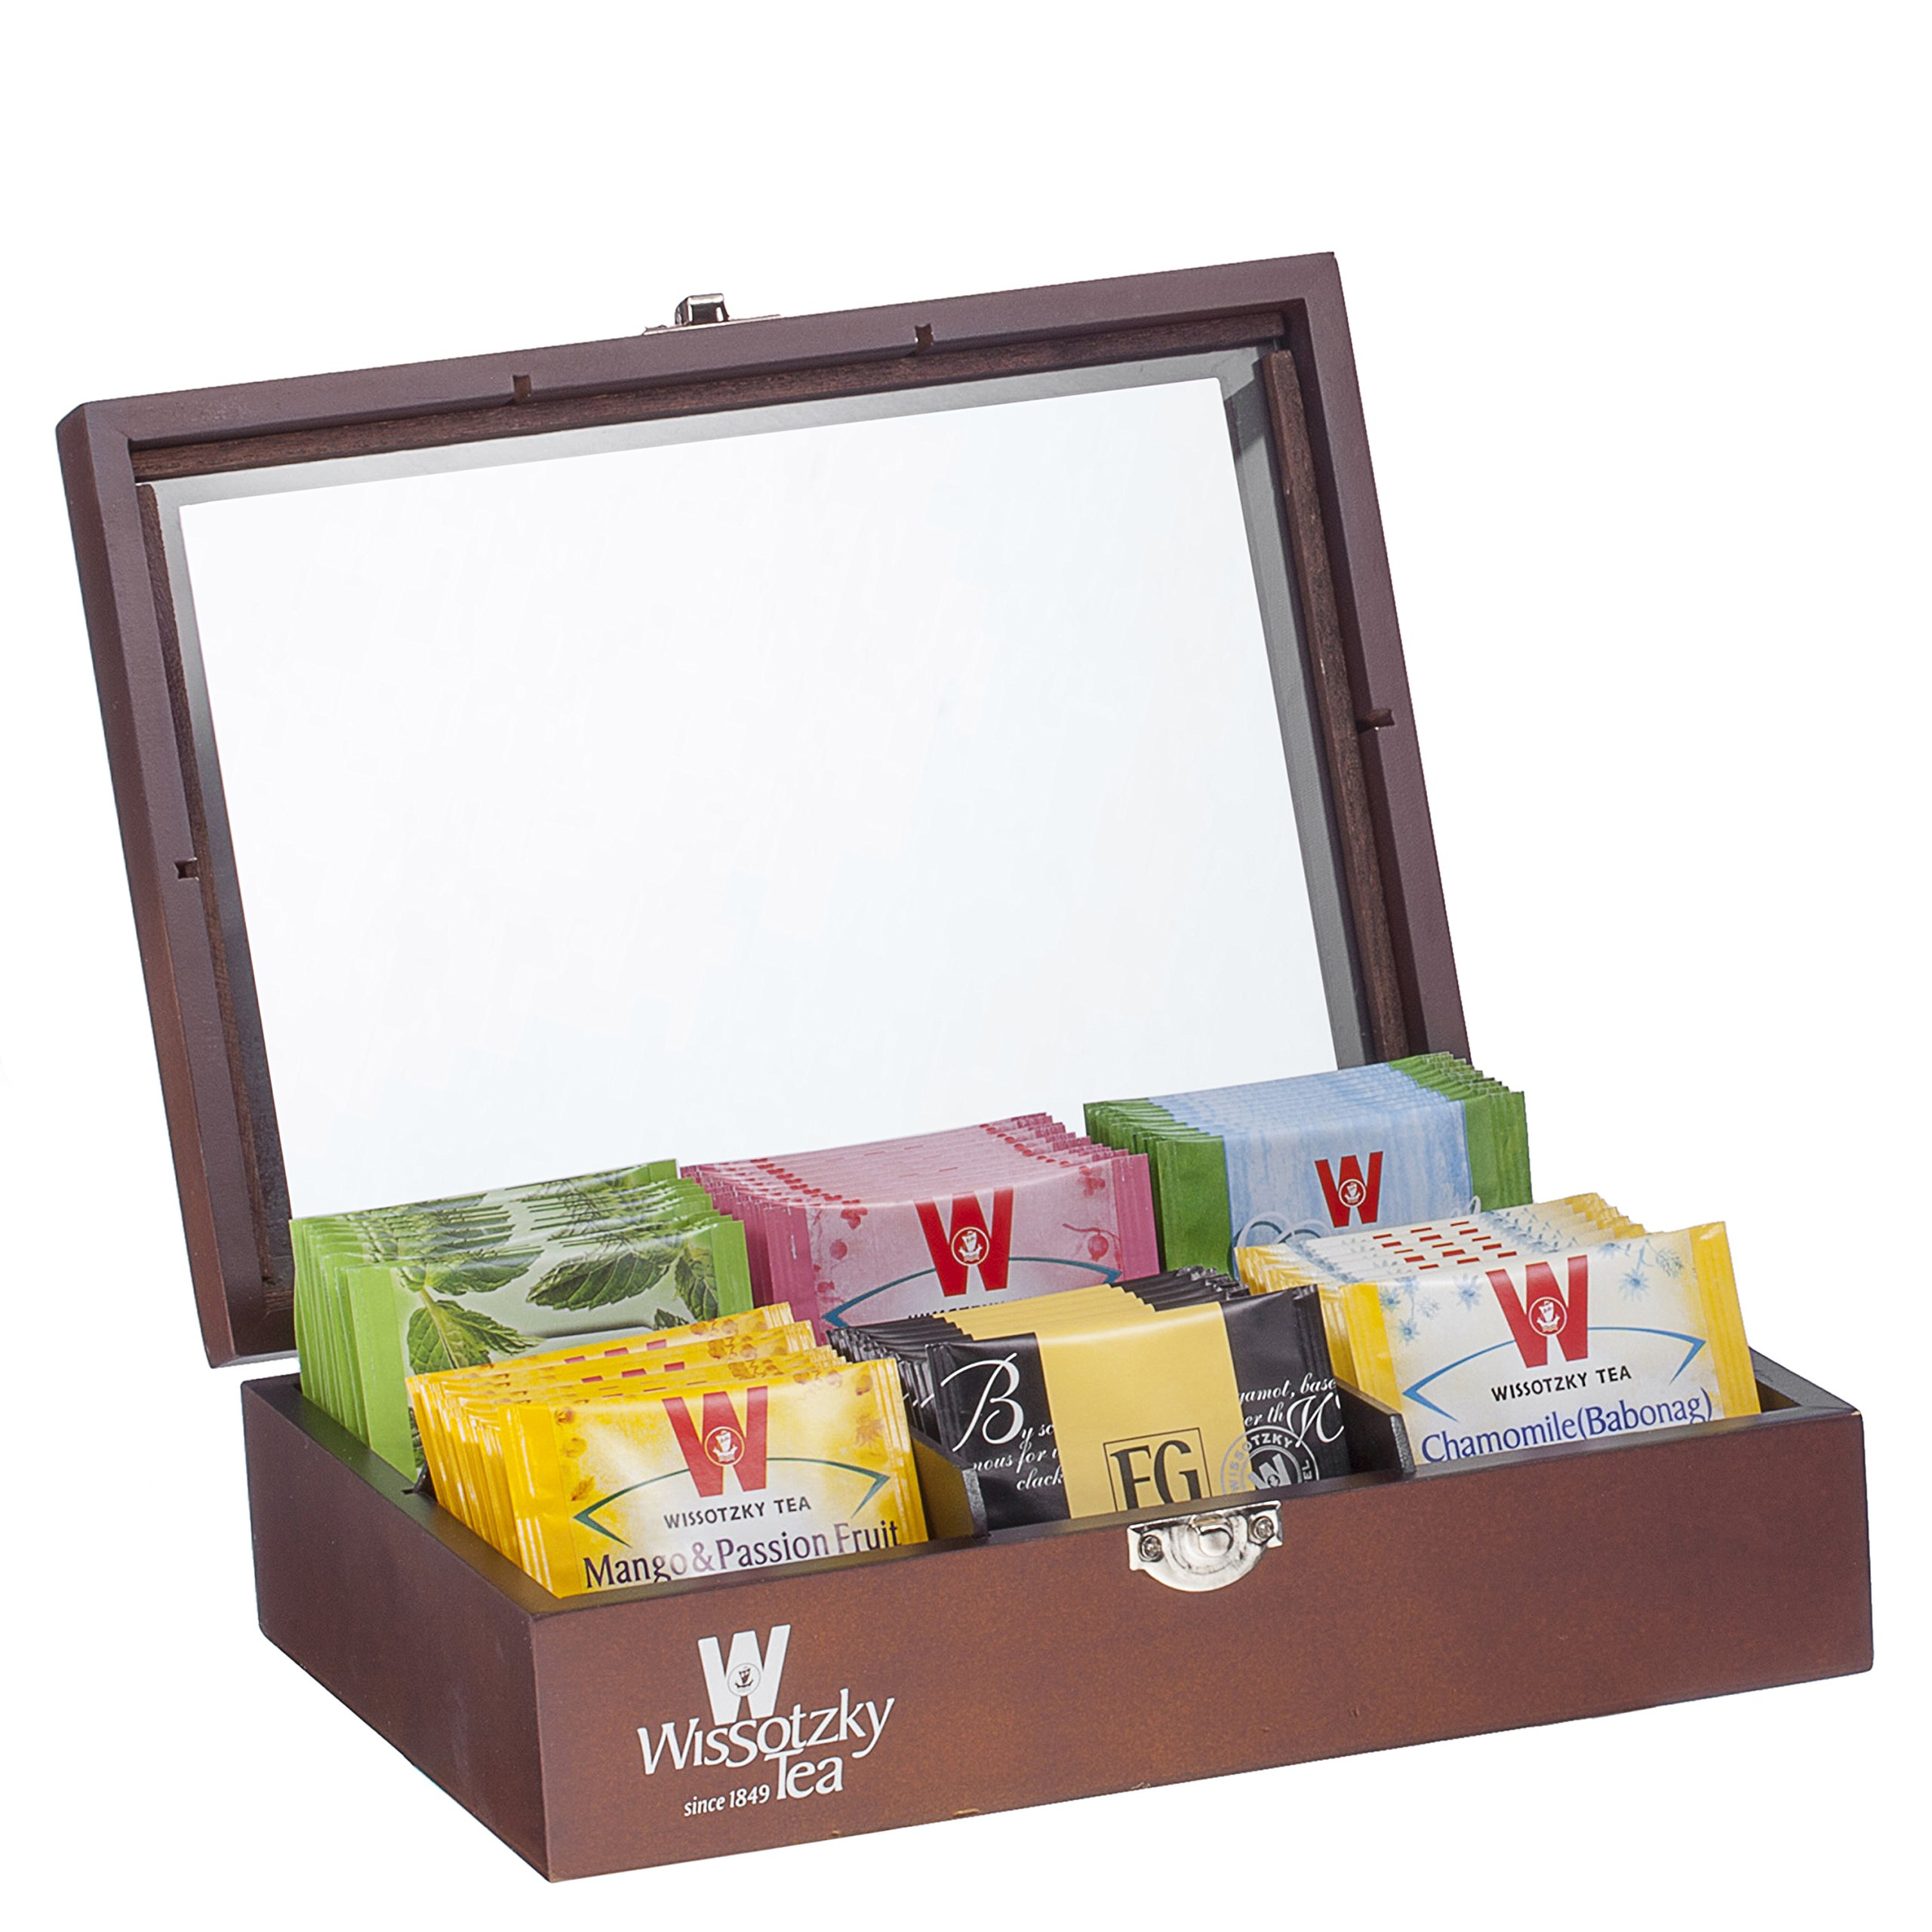 Wissotzky Tea 60 Dessert Flavored Teas in an Ebony Tea Chest - Flavors vary